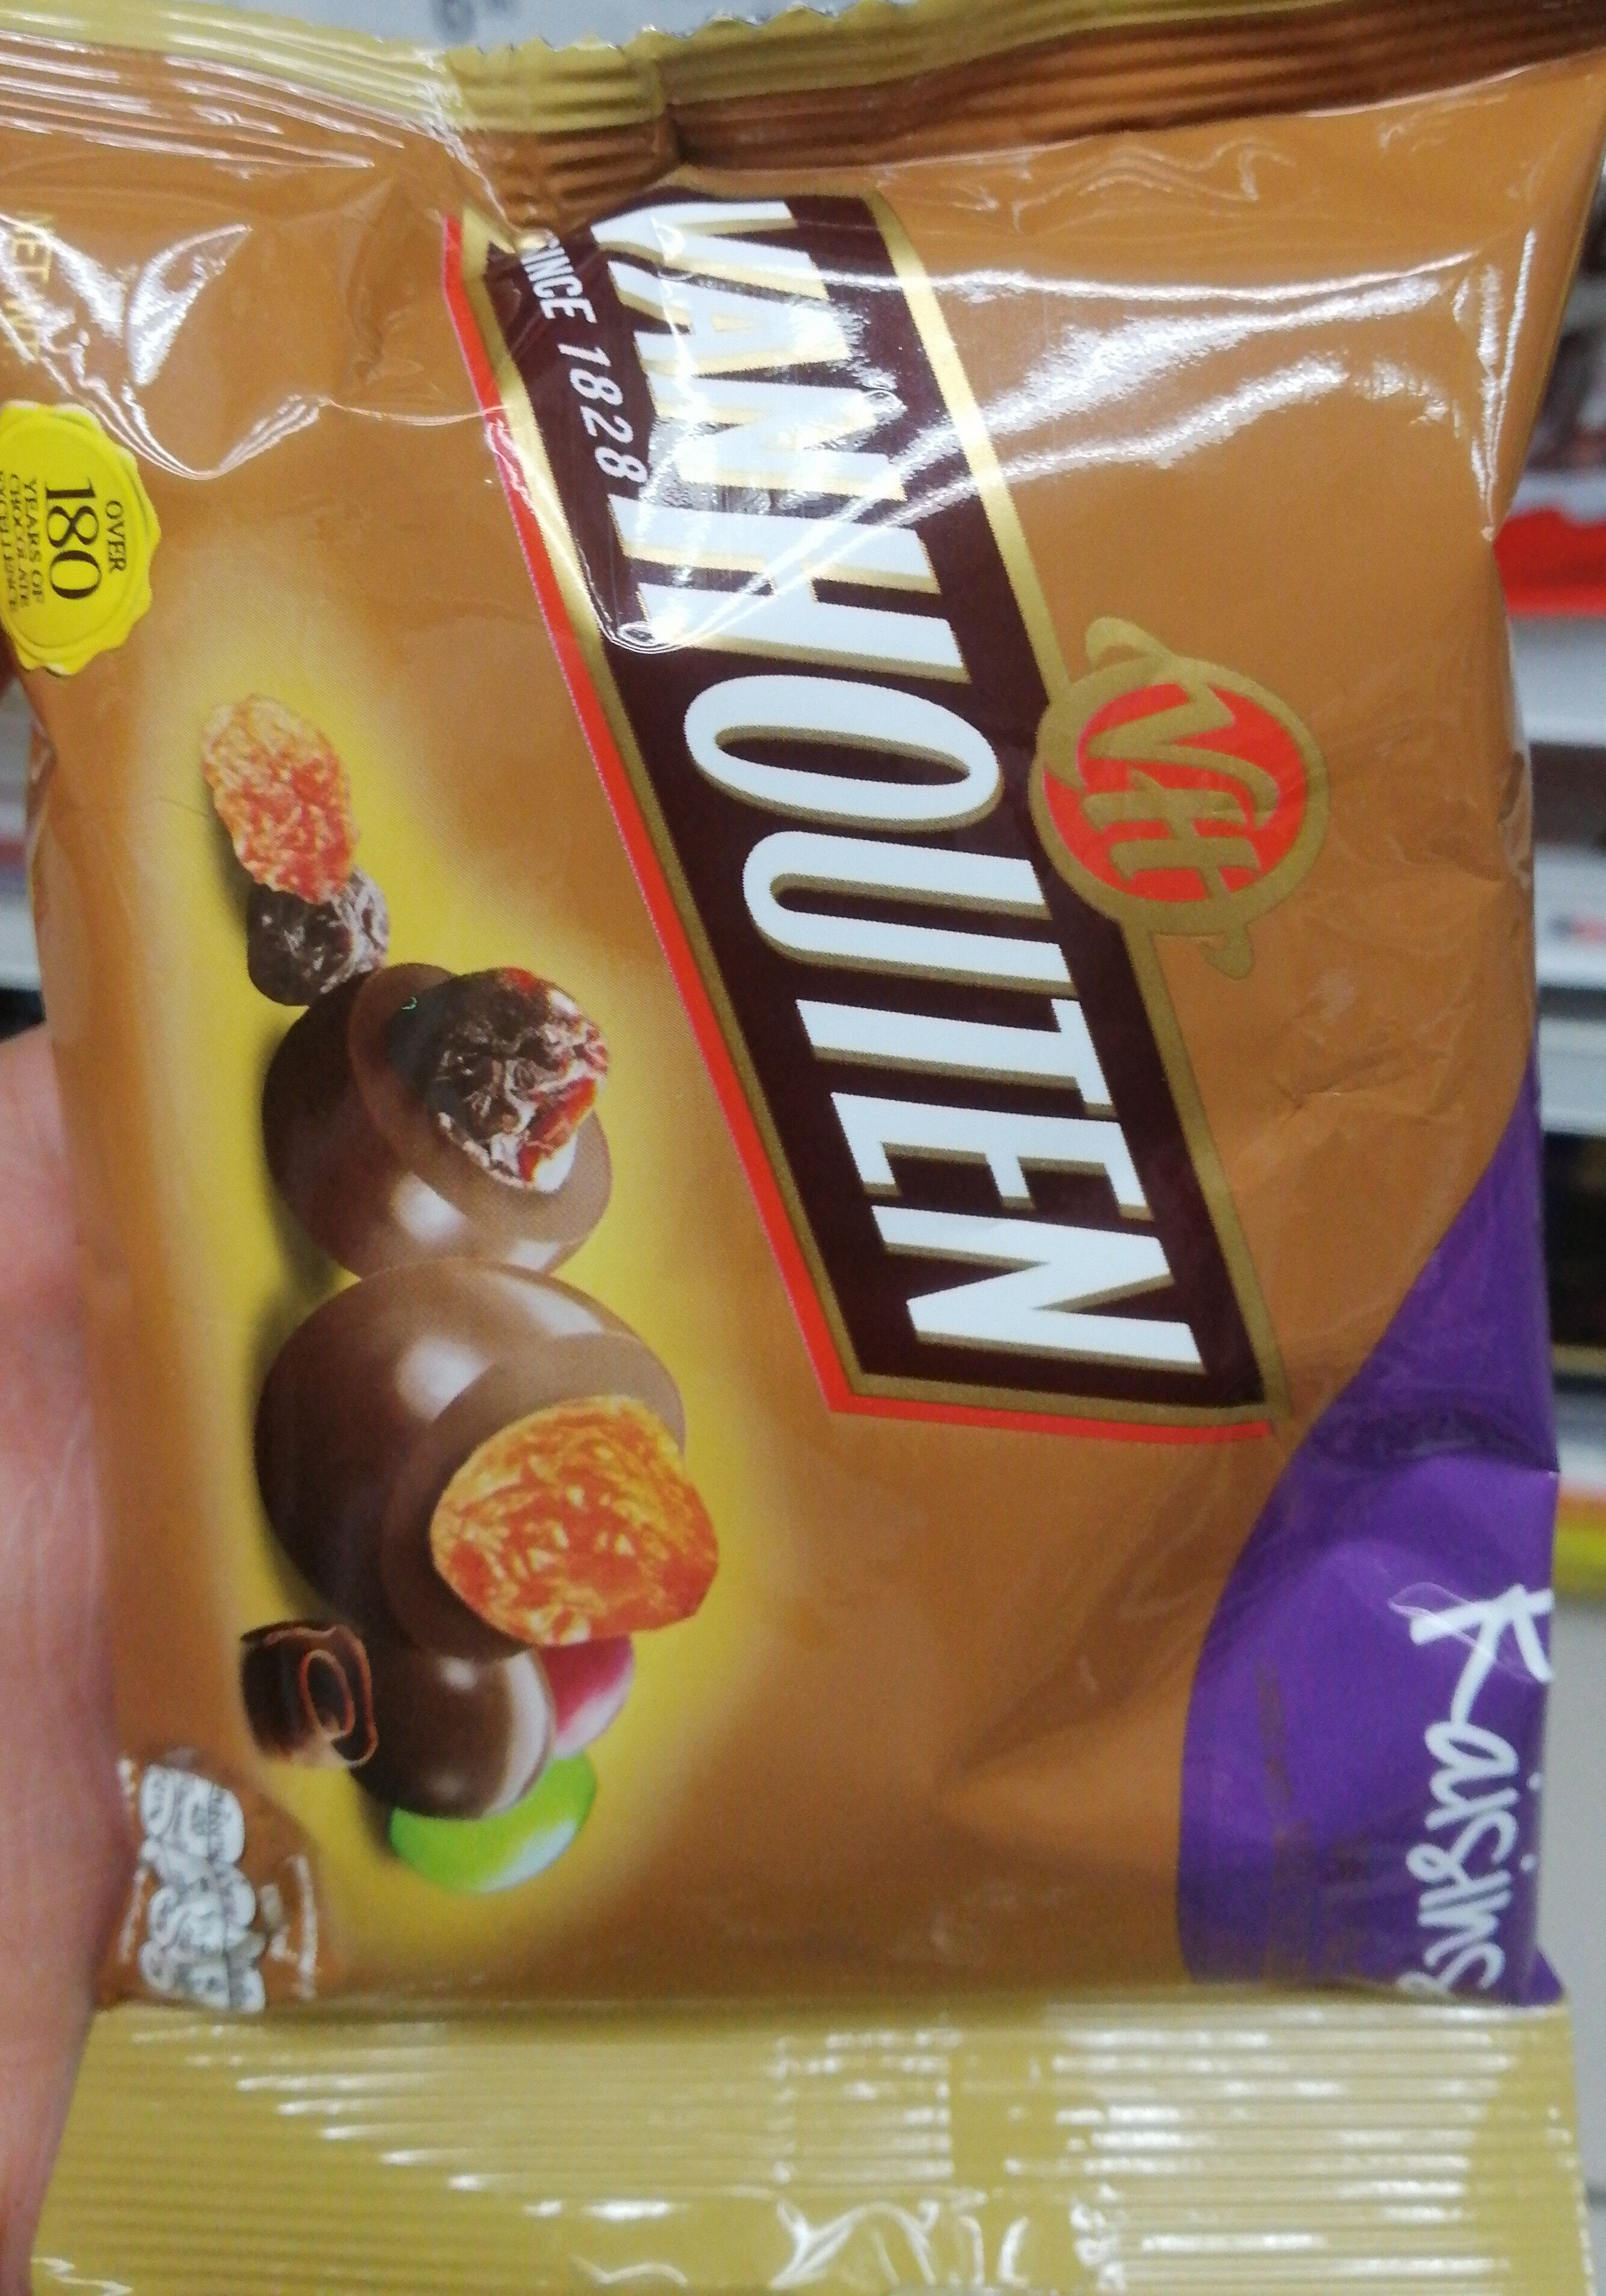 vanhouten raisins - Product